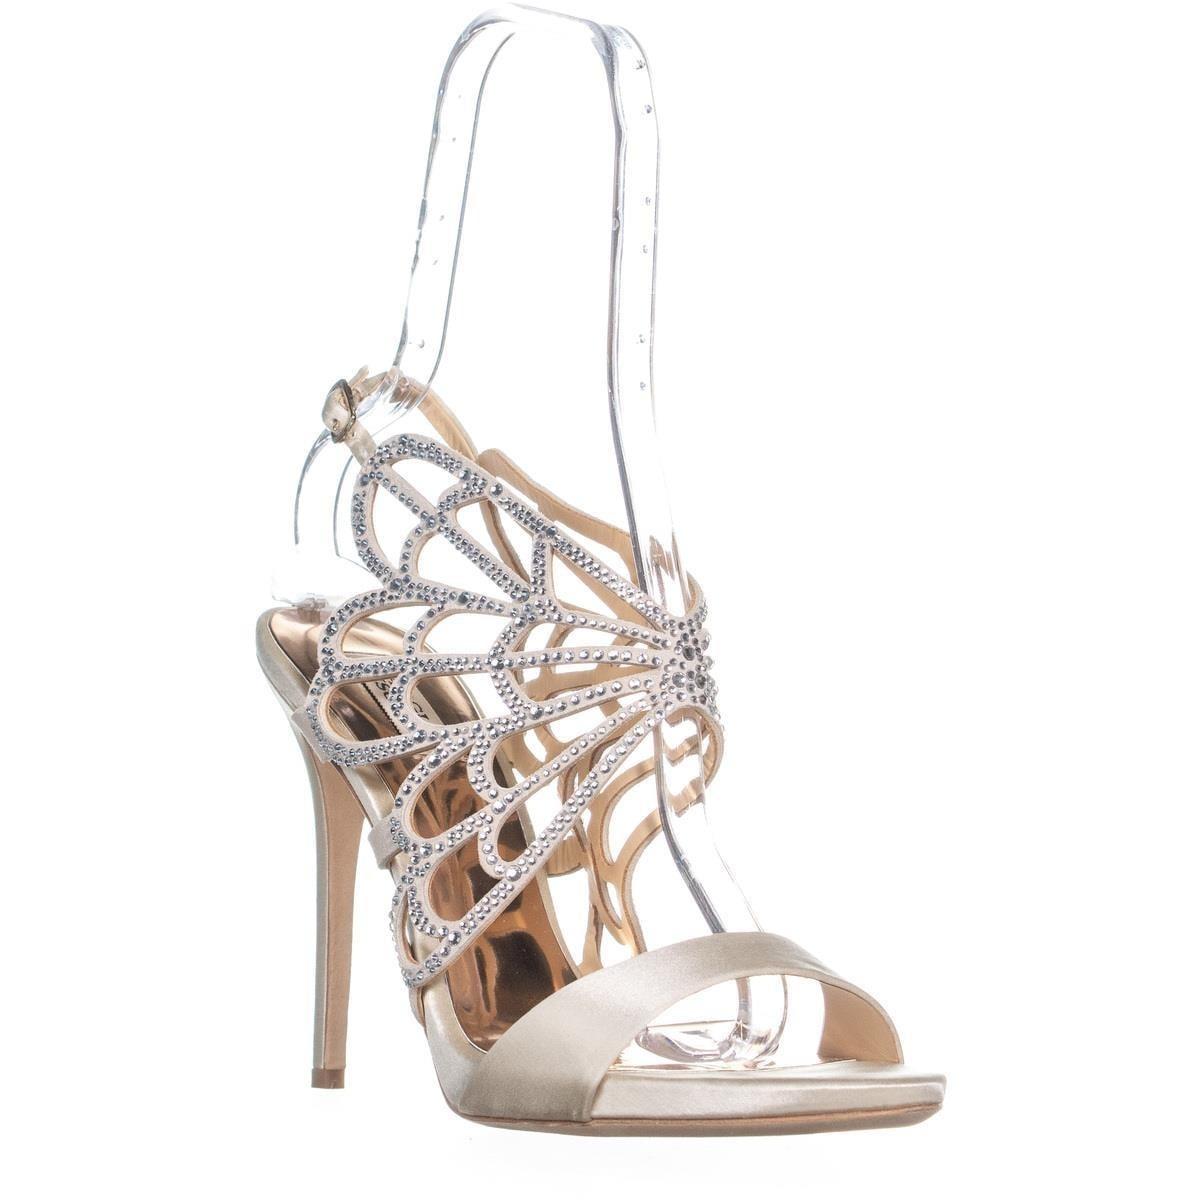 6e7db87ee7b7a8 Shop Badgley Mischka Newlyn Evening Sandals